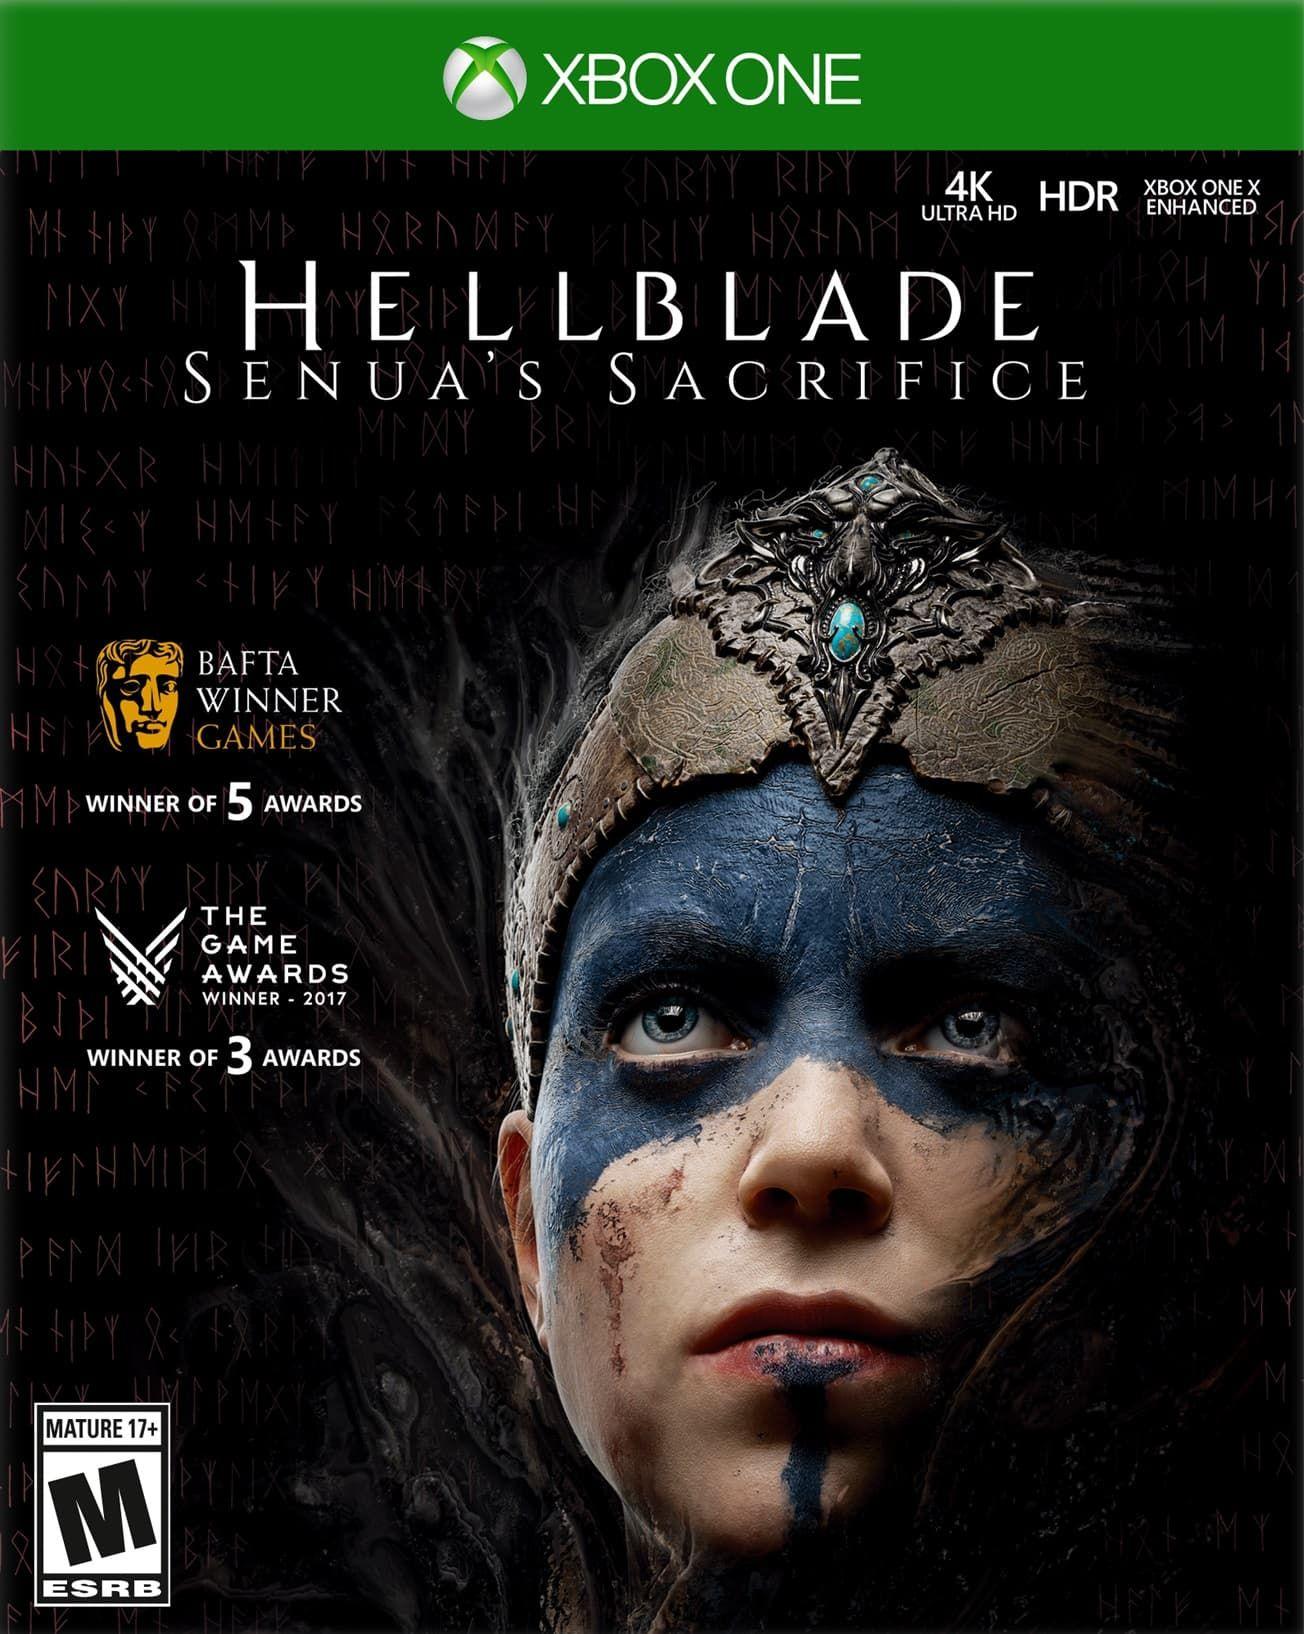 Hellblade: Senua's Sacrifice (MZU-00016) (Xbox One)